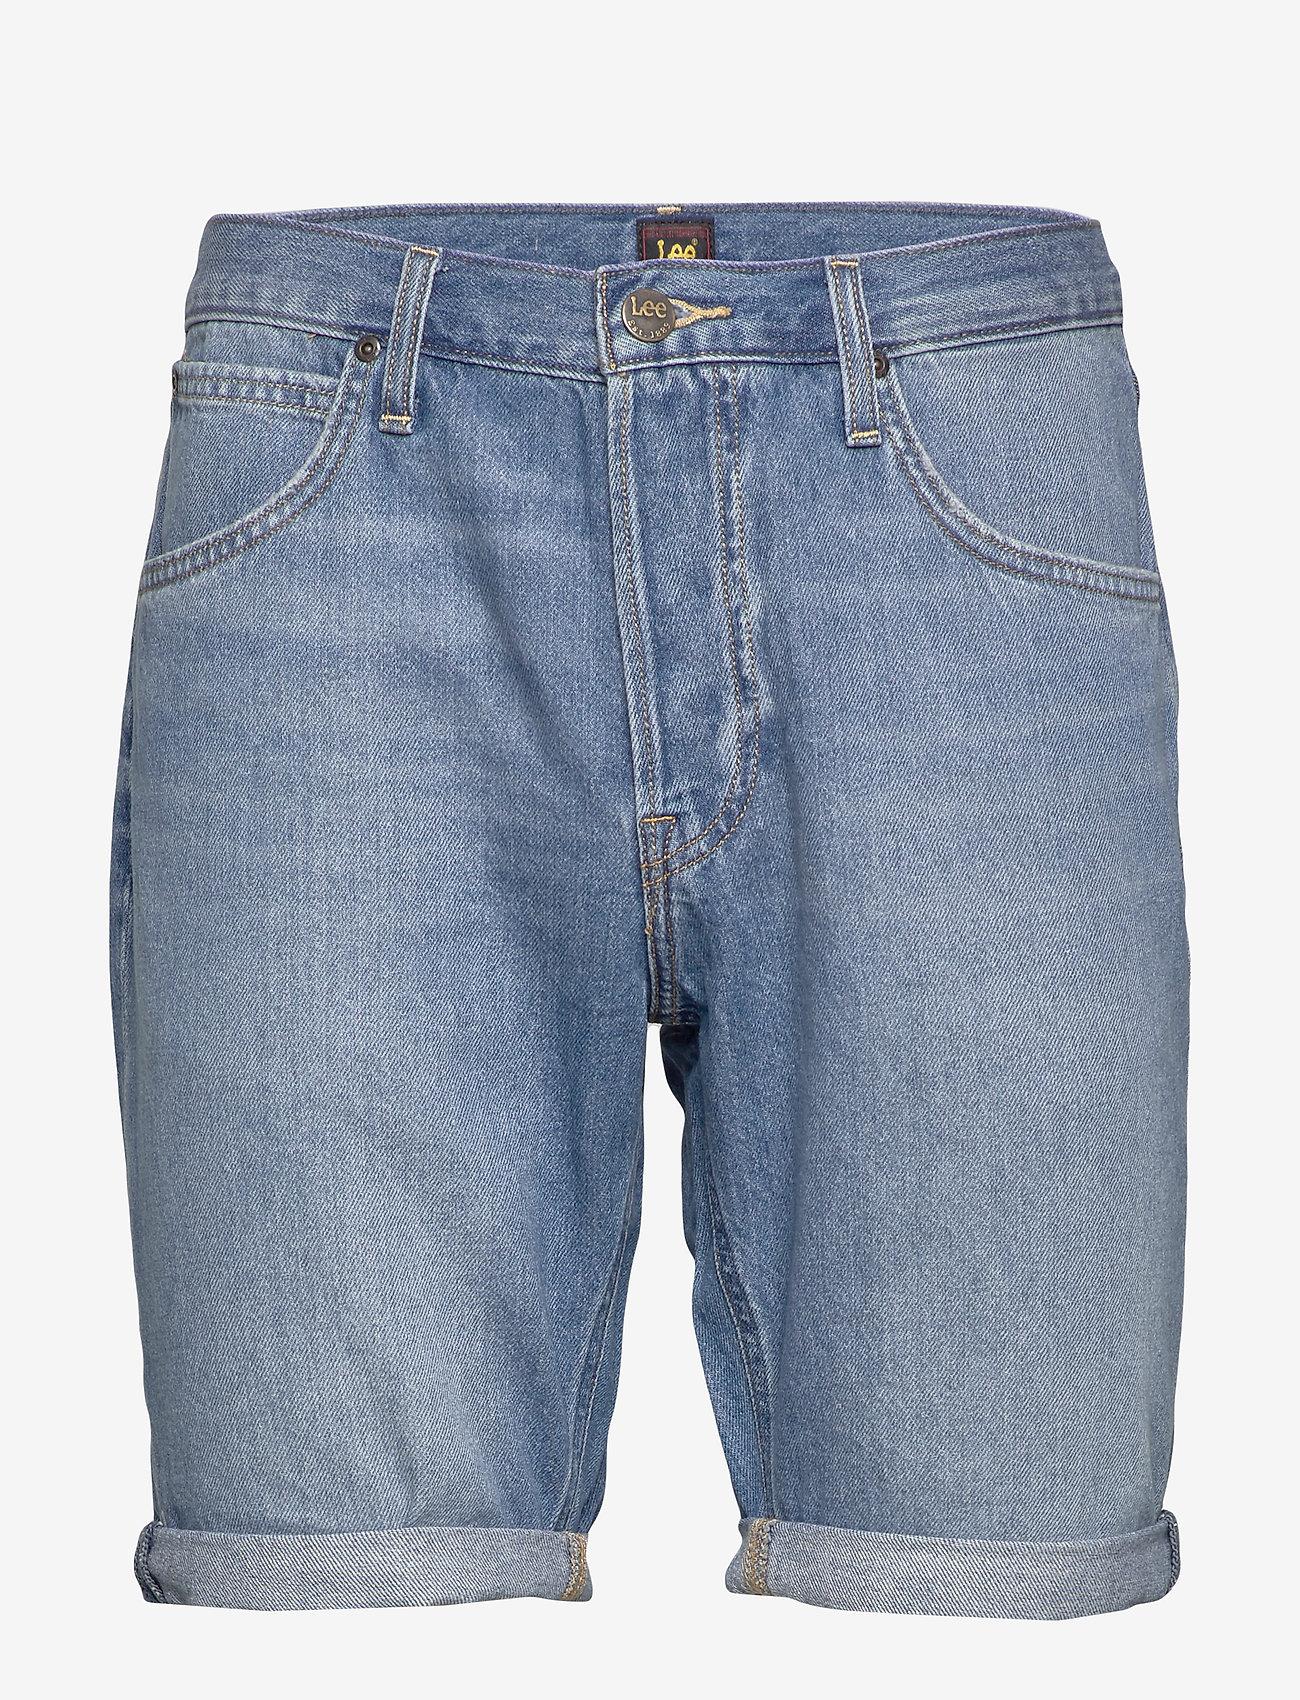 Lee Jeans - 5 POCKET SHORT - farkkushortsit - baybridge - 1